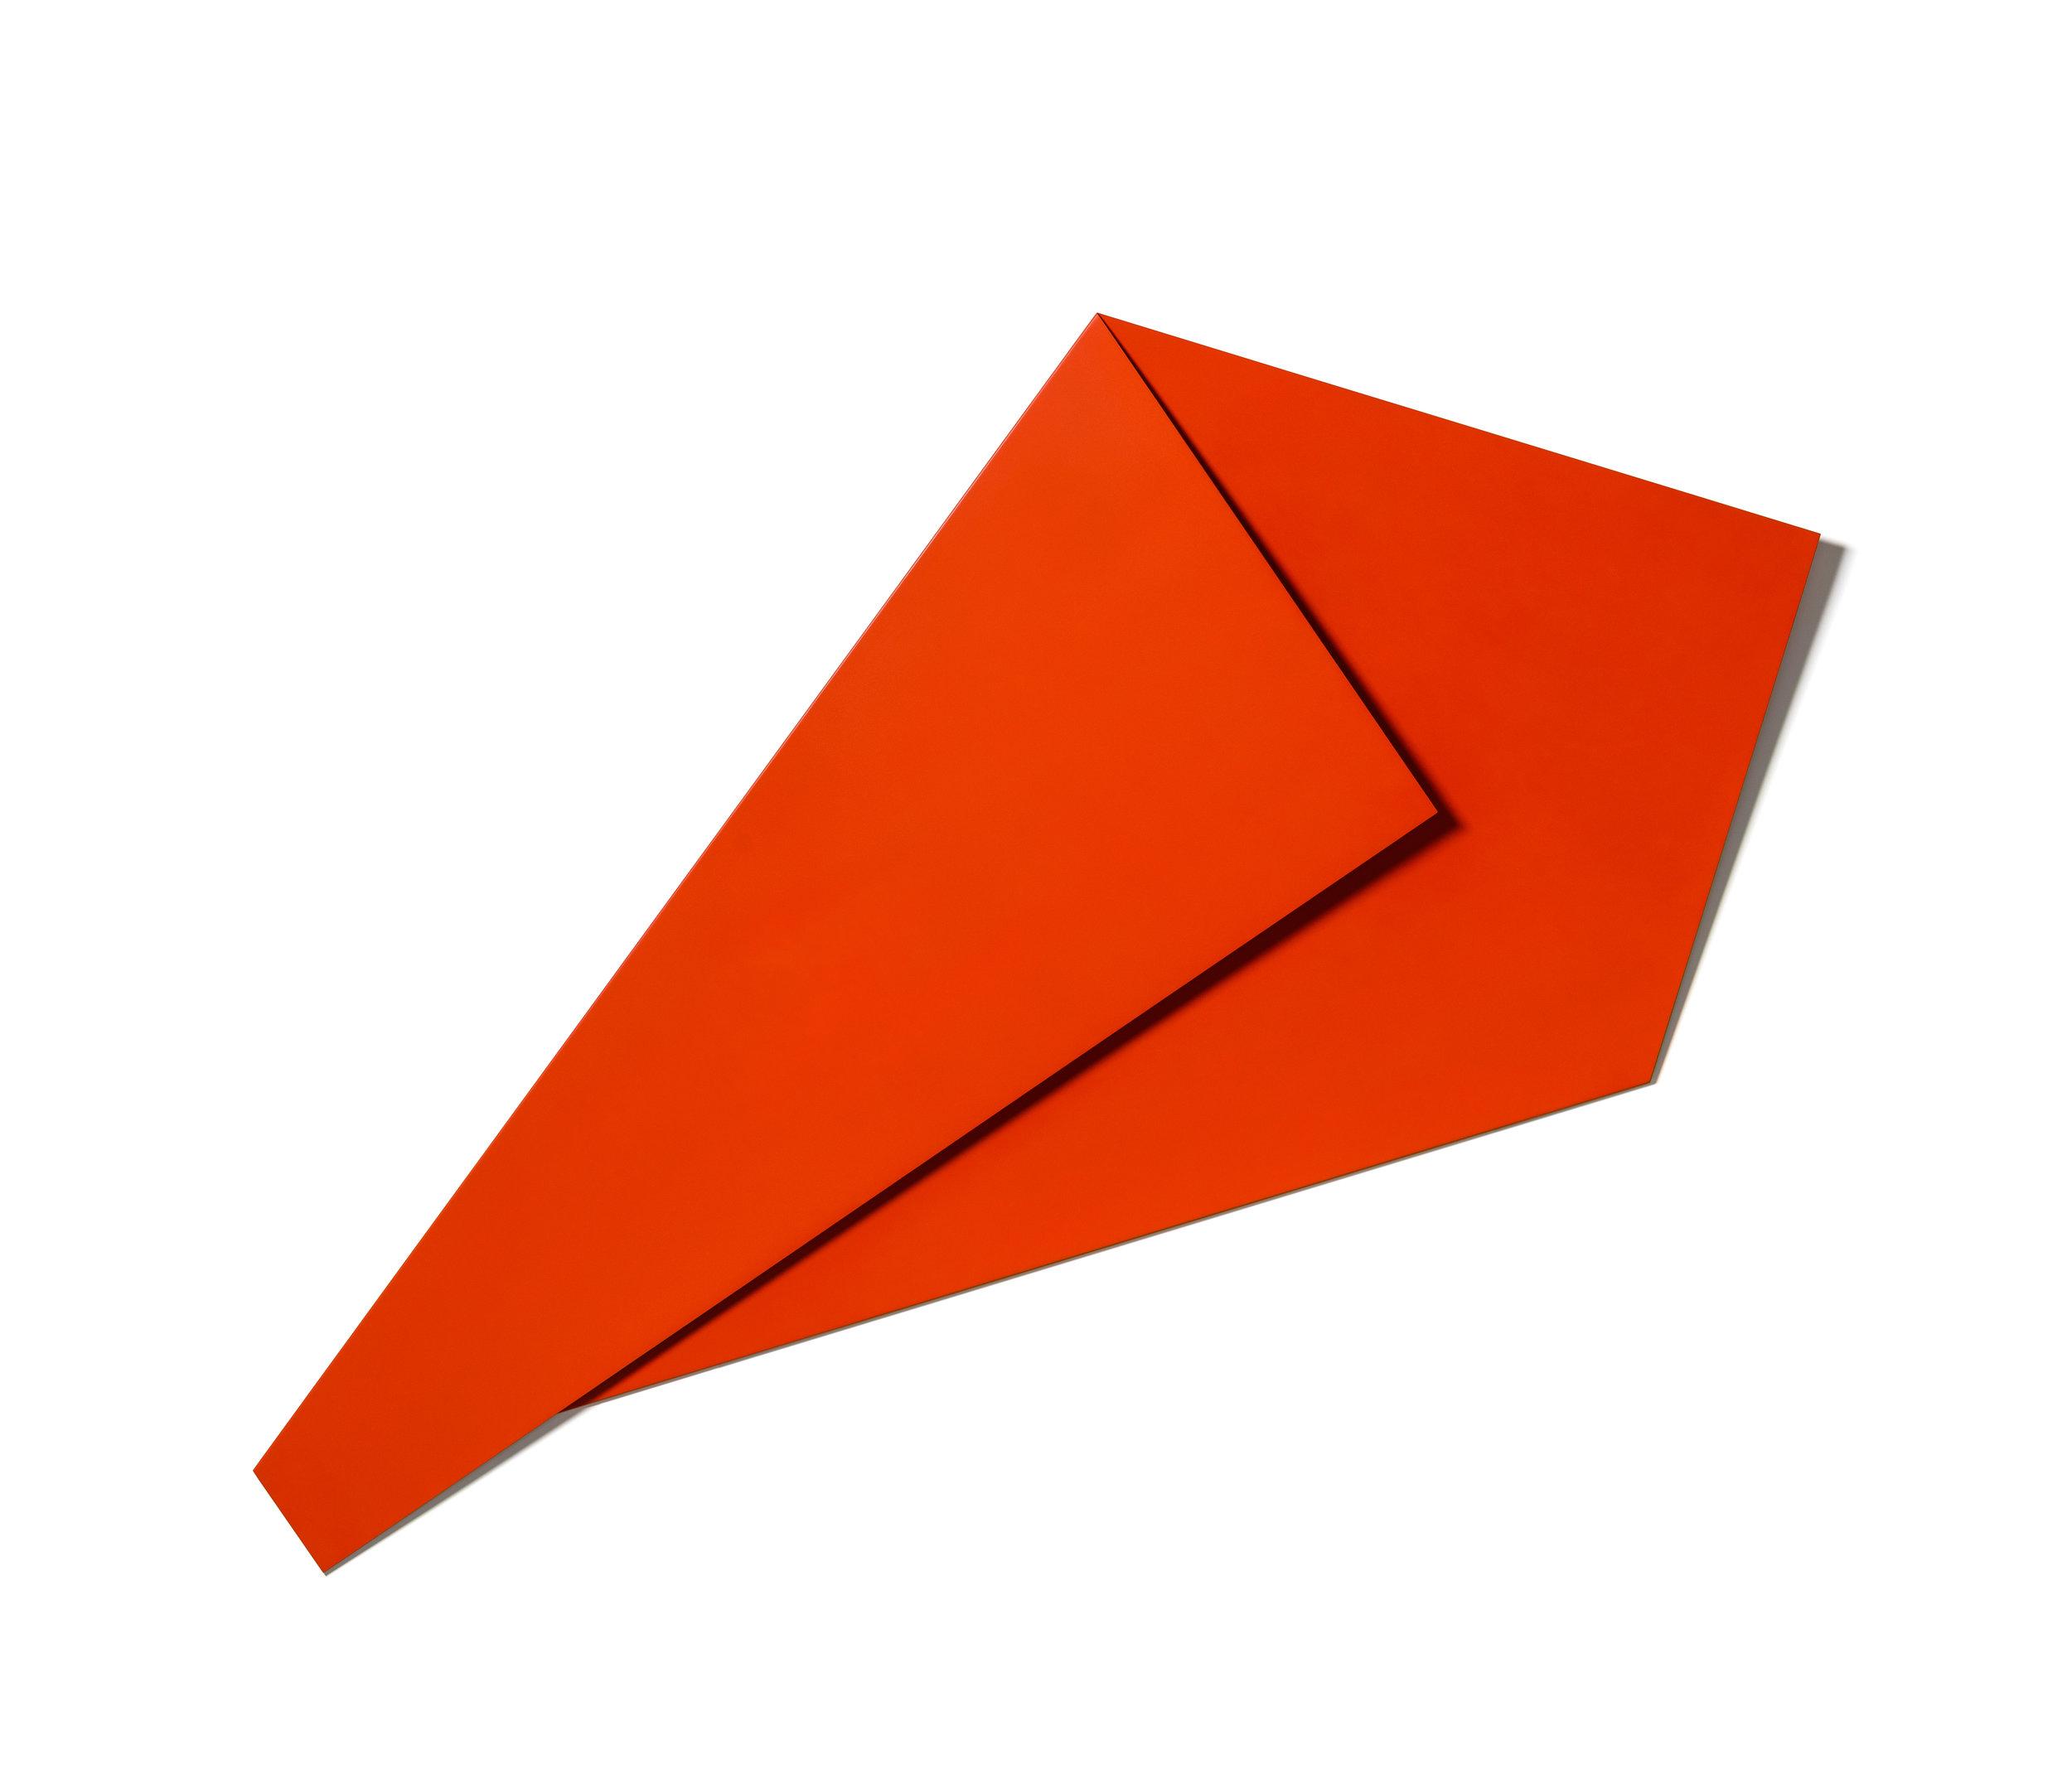 XL Folded Flat Red 02 S-1143 bearbeitet.jpg